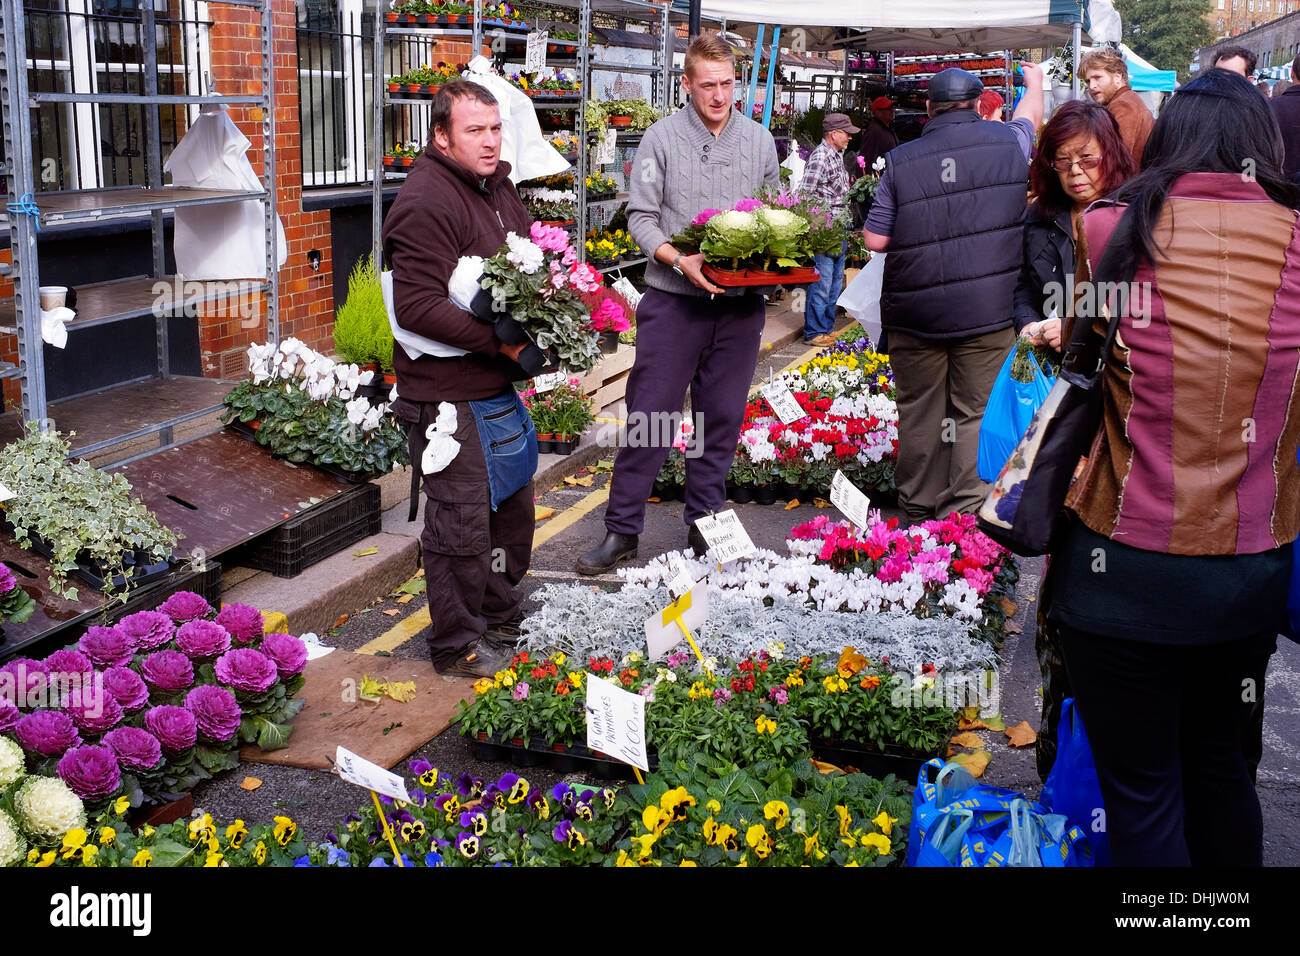 Columbia Road Flower Market, East London, UK Photo Stock